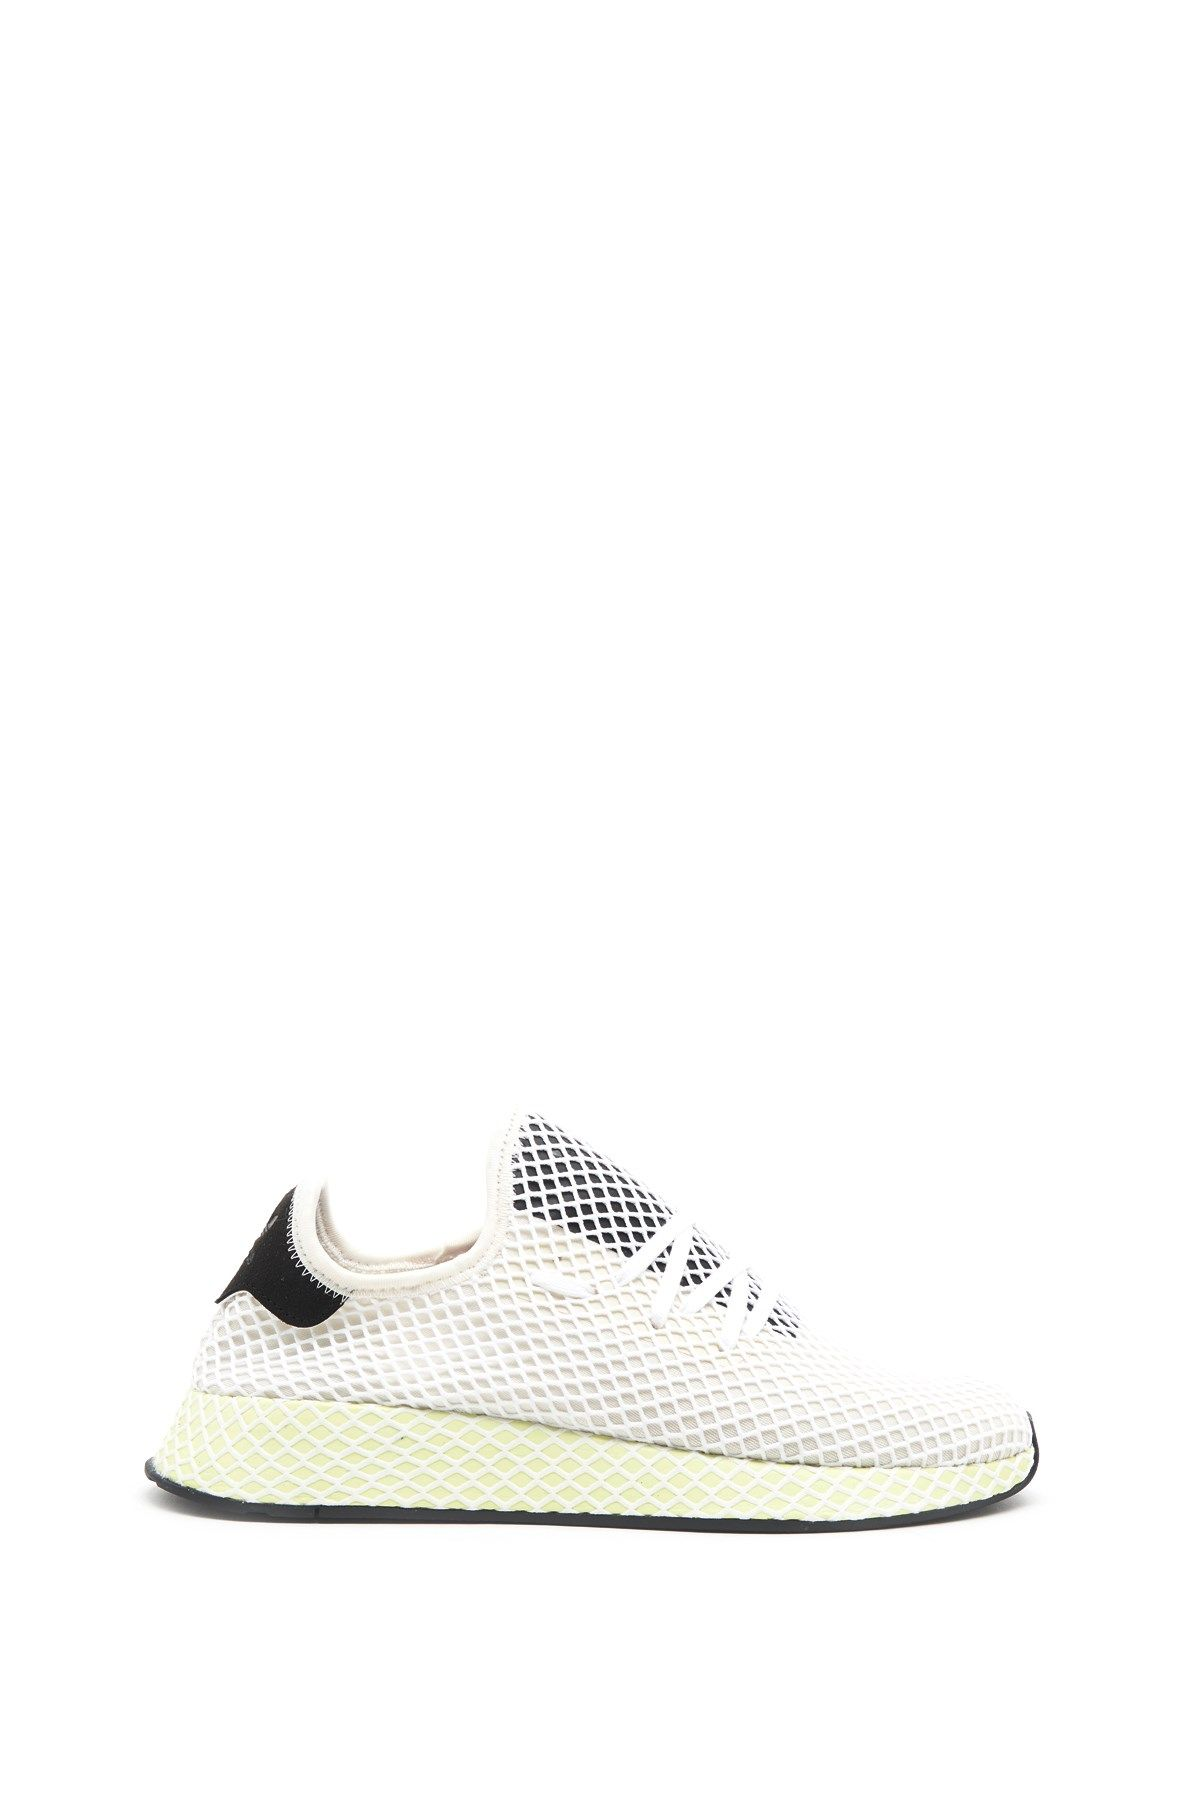 huge discount b9ab6 b1701 ADIDAS ORIGINALS deerupt runner sneakers.  adidasoriginals  shoes